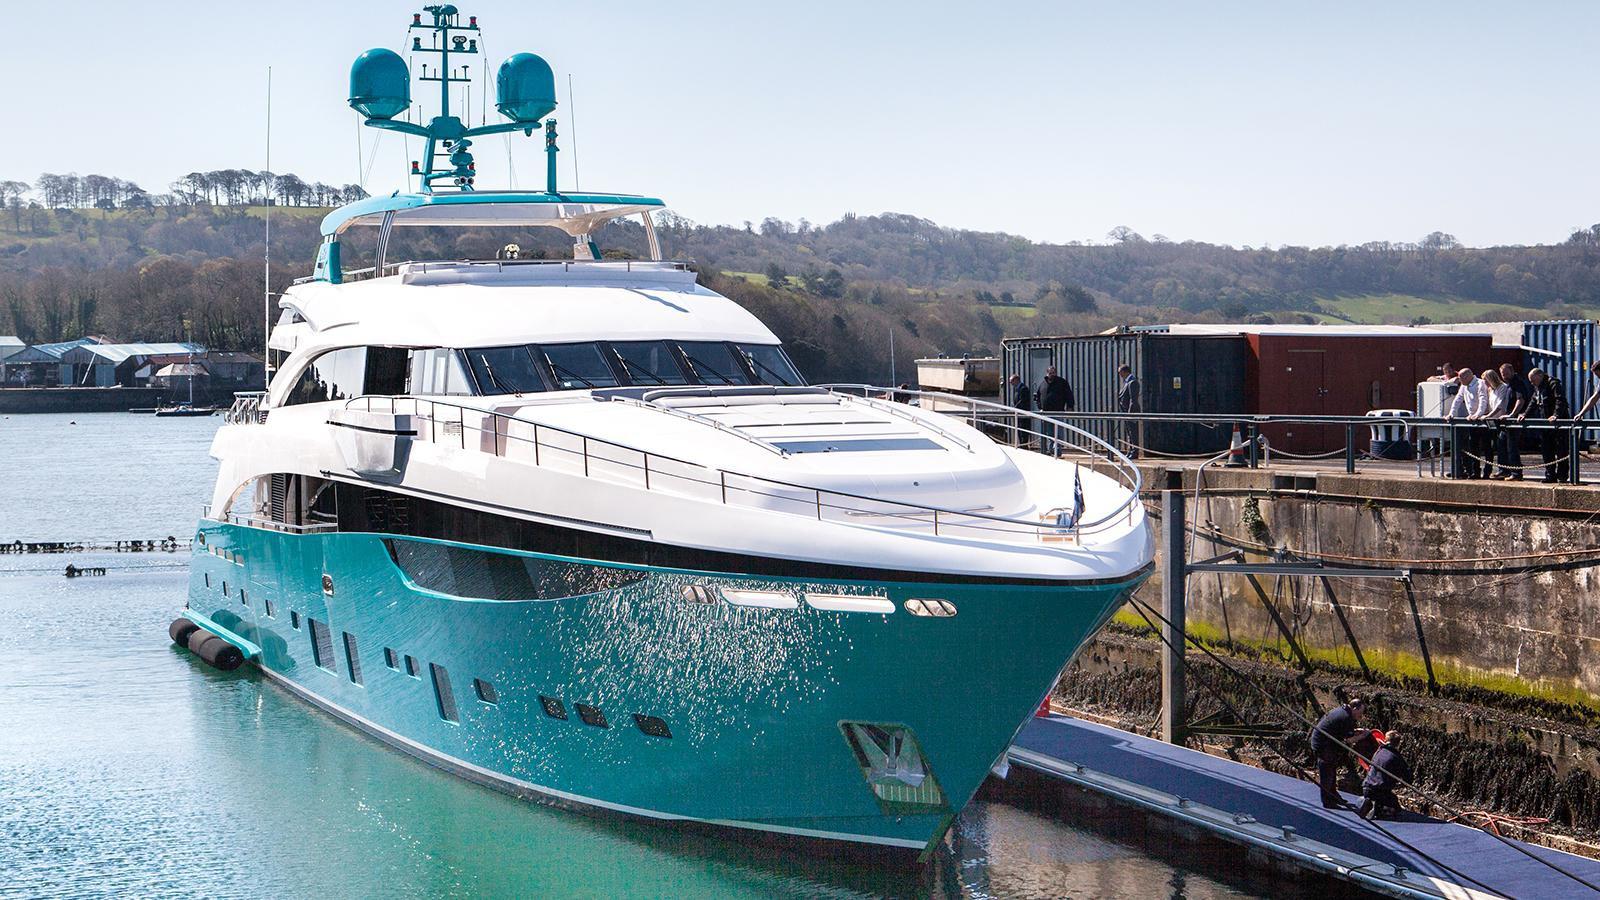 Bright Turquoise Princess 40M Yacht Named Anka